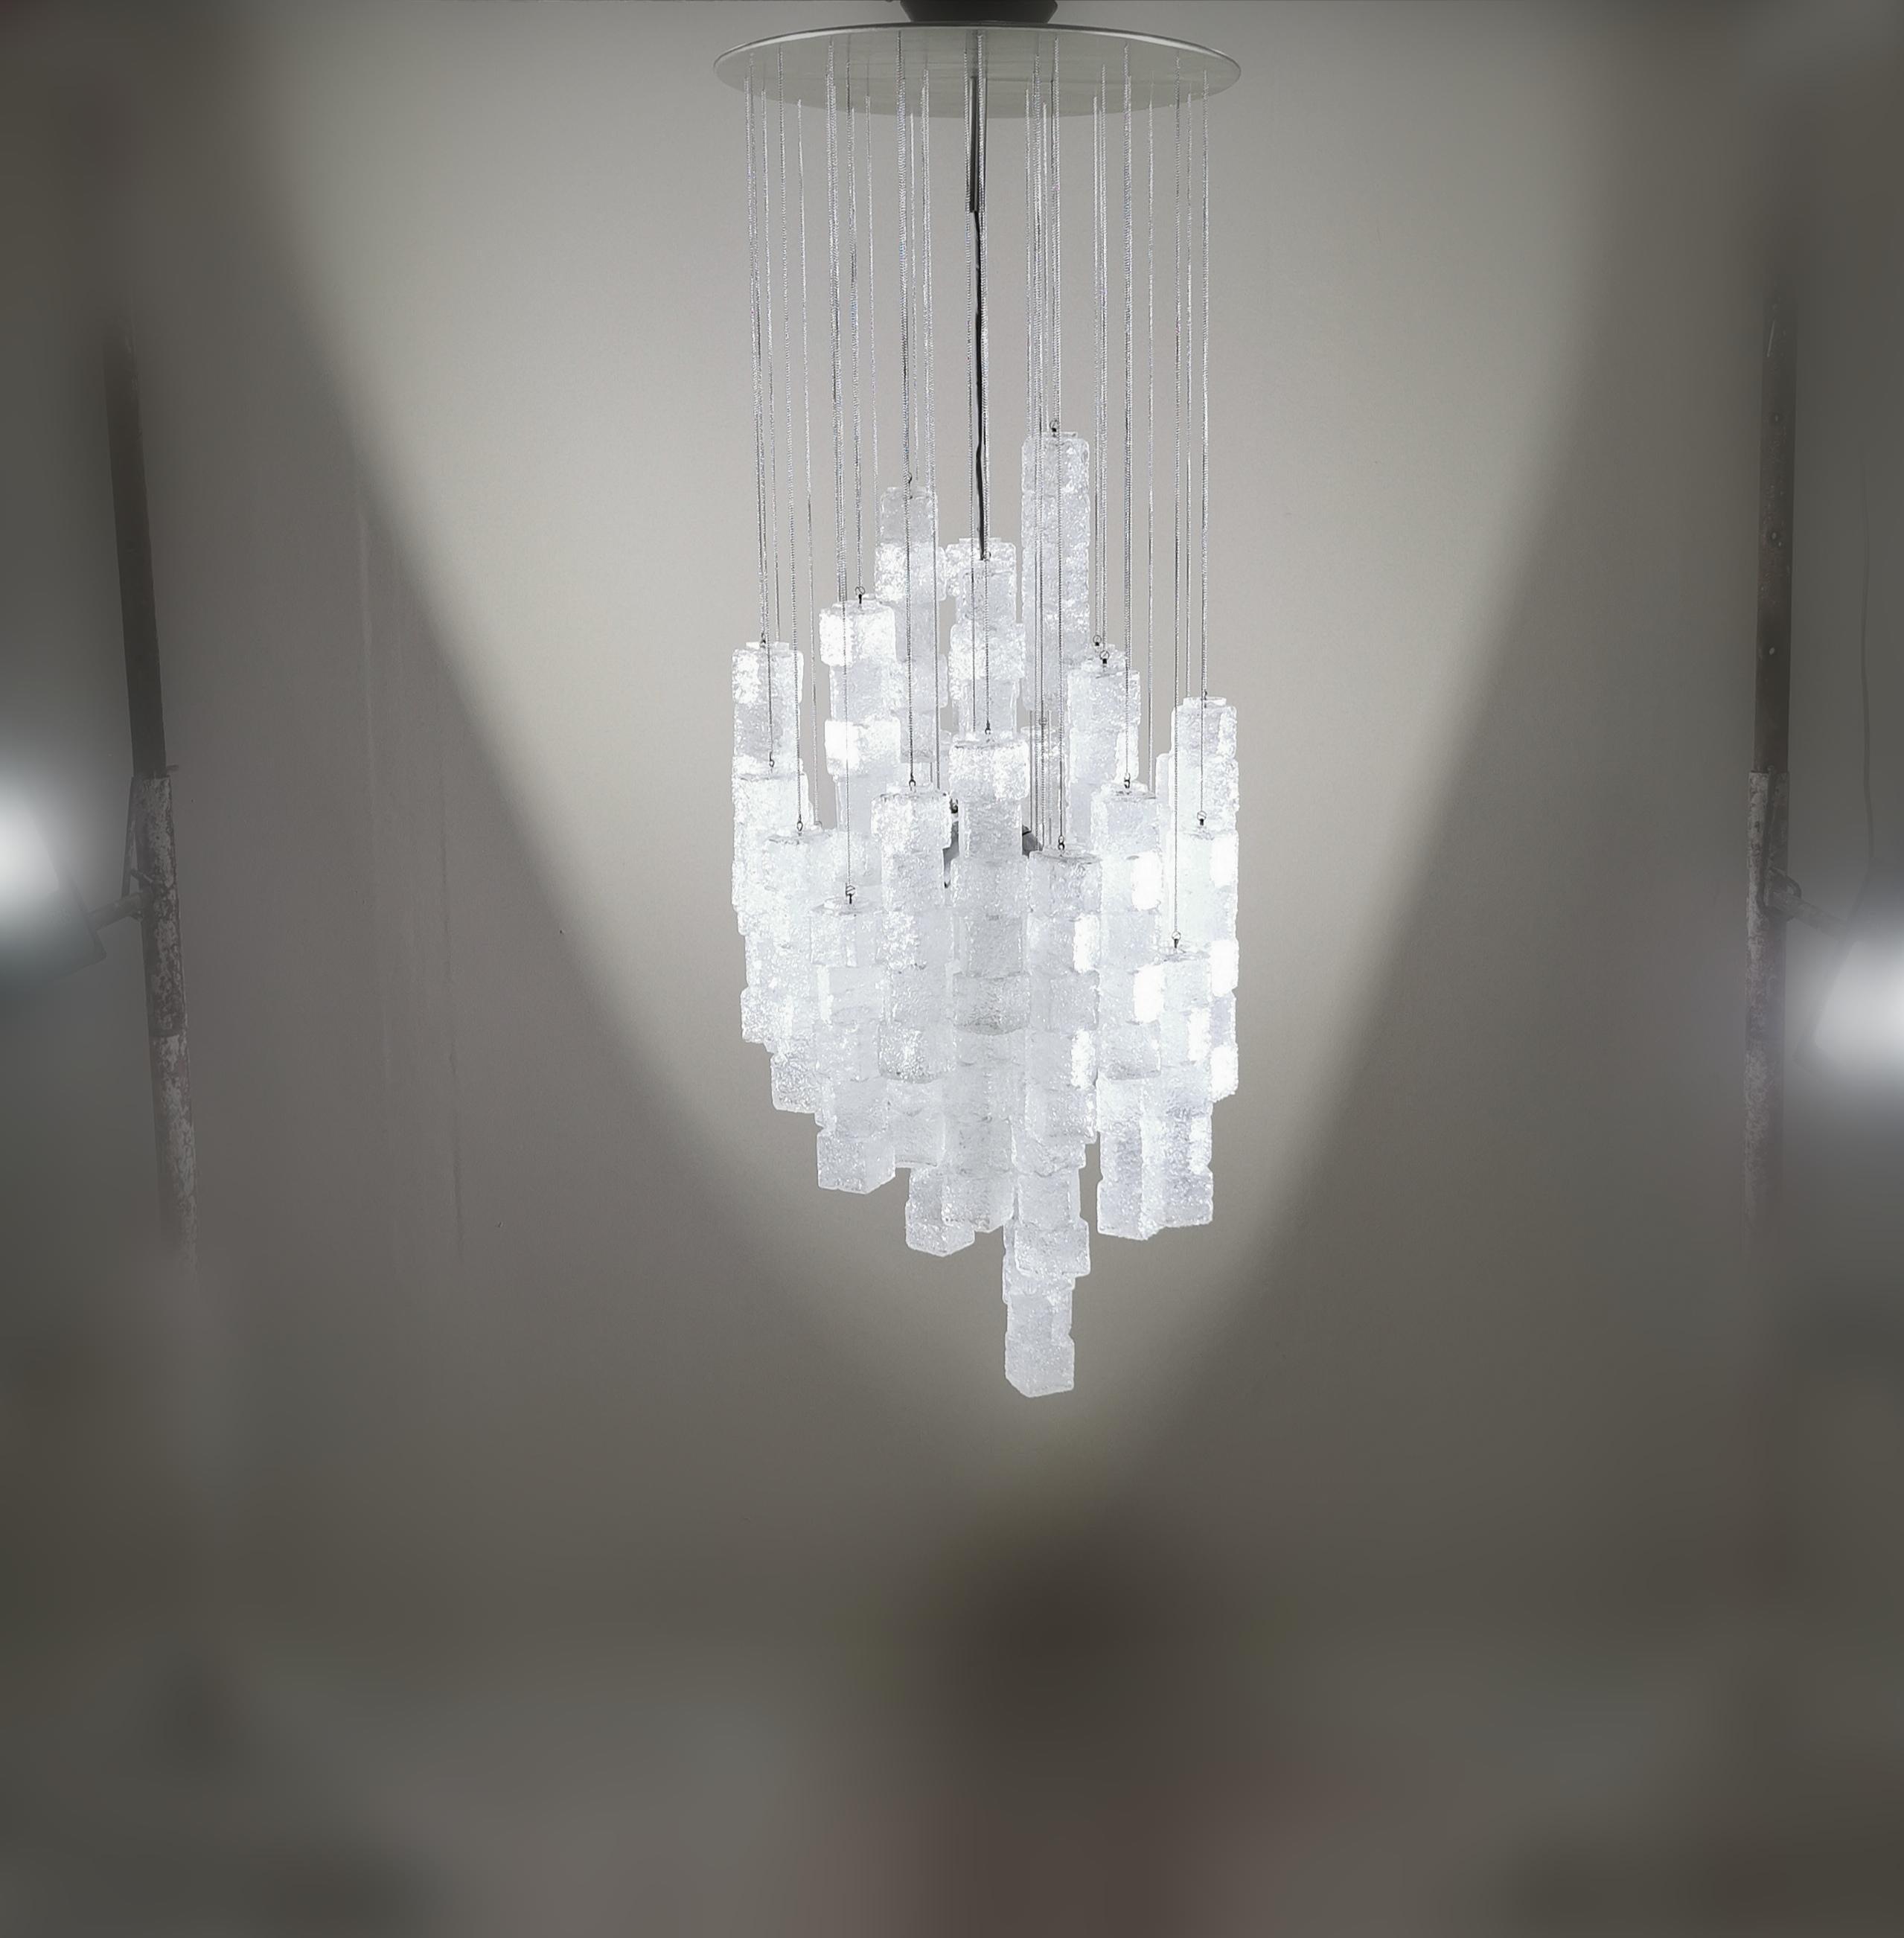 Italian vintage murano glass and chrome chandelier by Zero4 Milano.